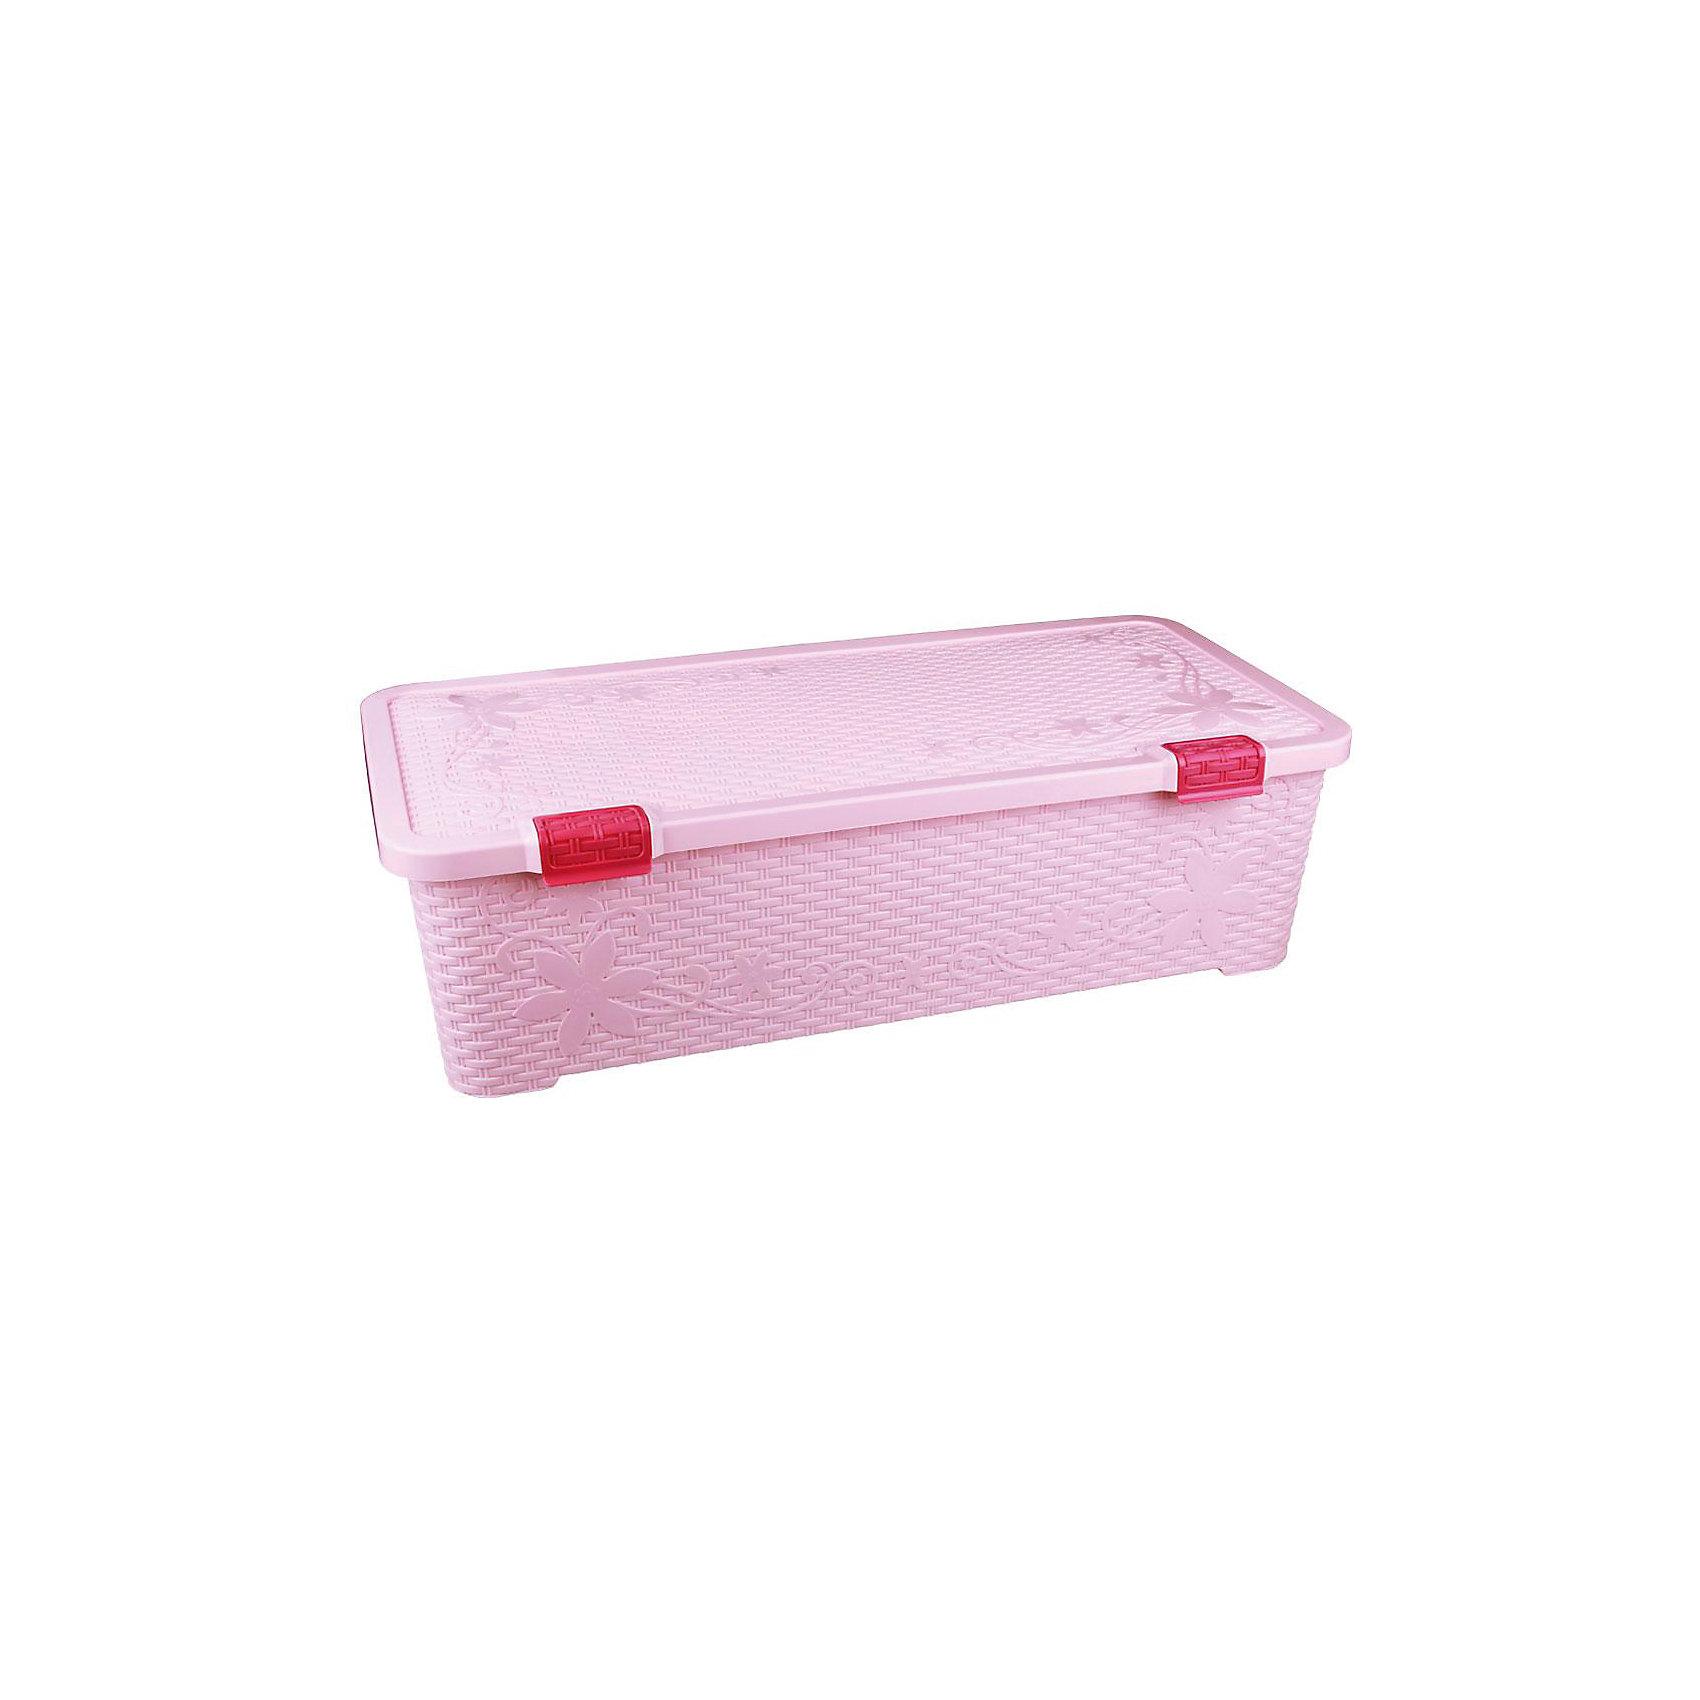 Alternativa Контейнер Плетёнка 70 л. с крышкой, Alternativa, розовый alternativa ящик для инструментов 585х255х250 alternativa